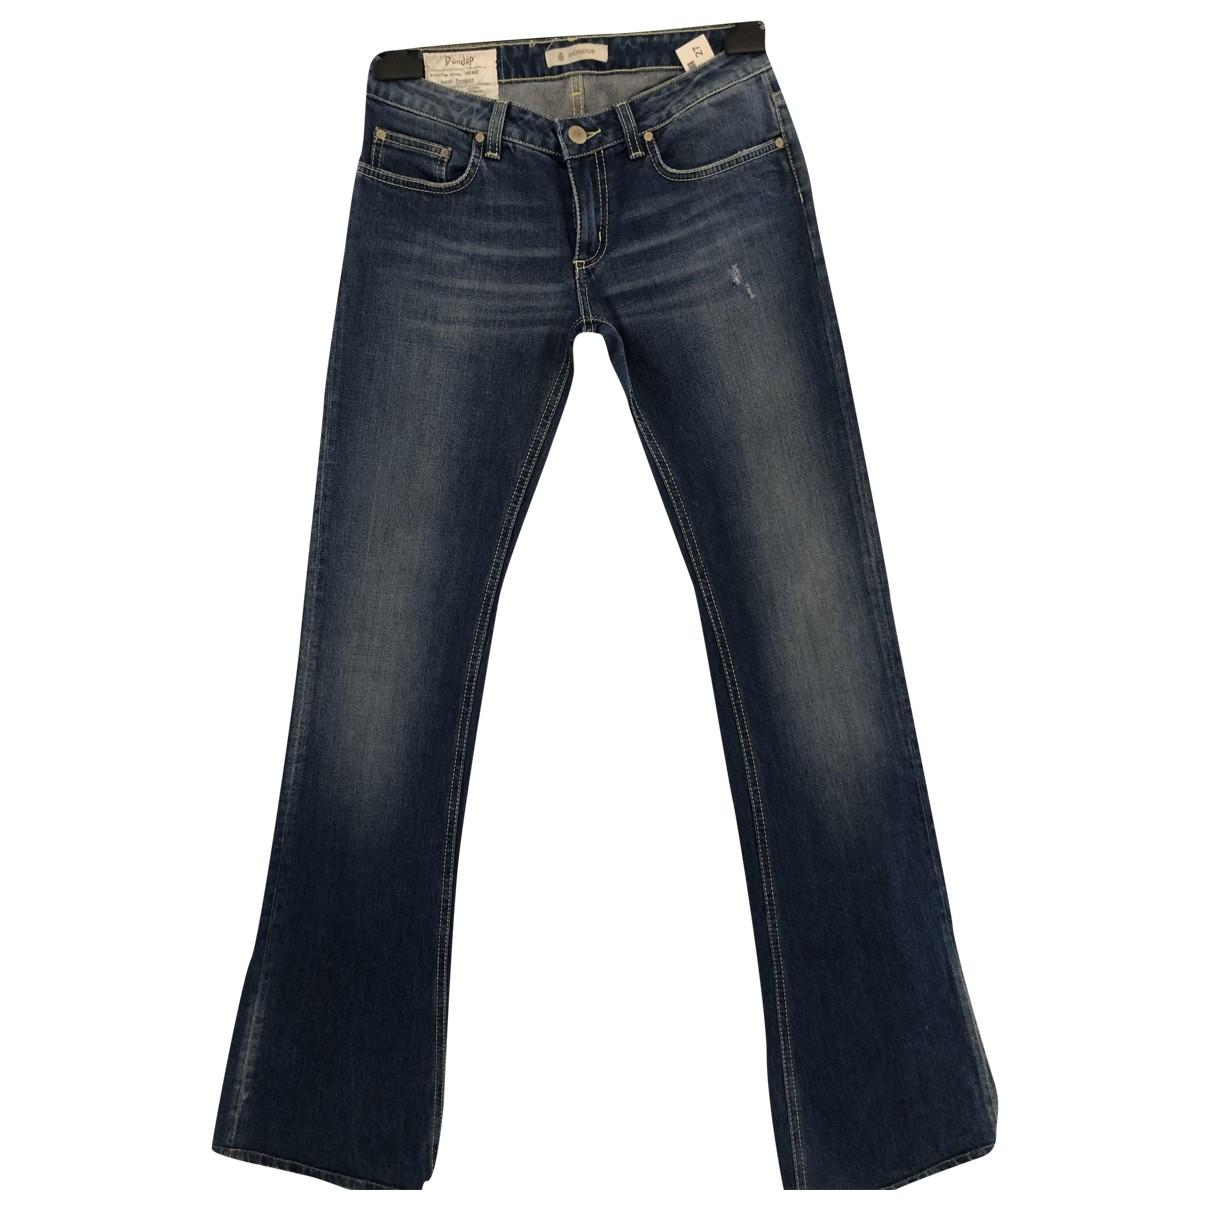 Dondup \N Blue Denim - Jeans Jeans for Women 27 US